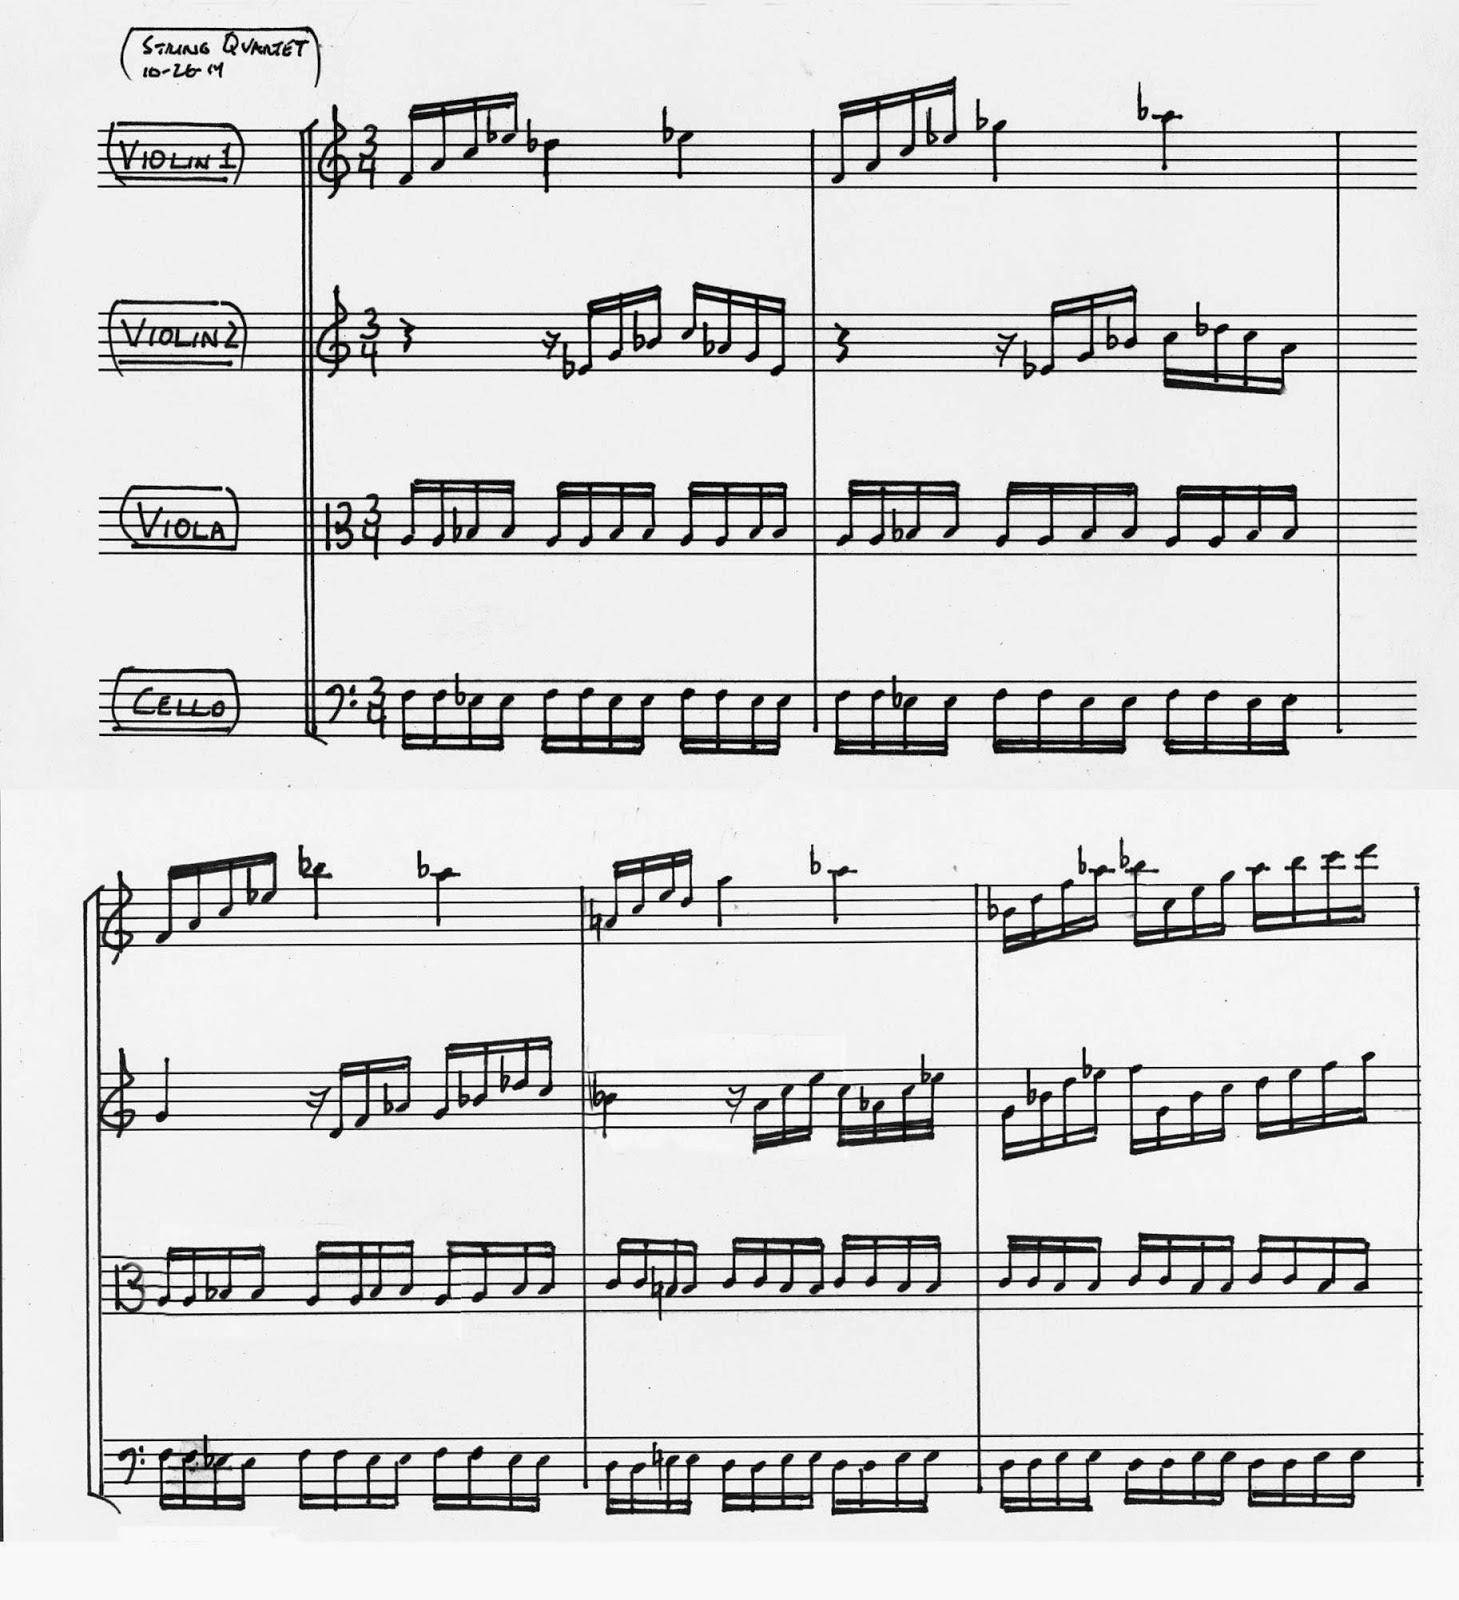 Piano Sheet Music For Shenandoah: Finding Beauty In Ephemera: Diabelli Project 085